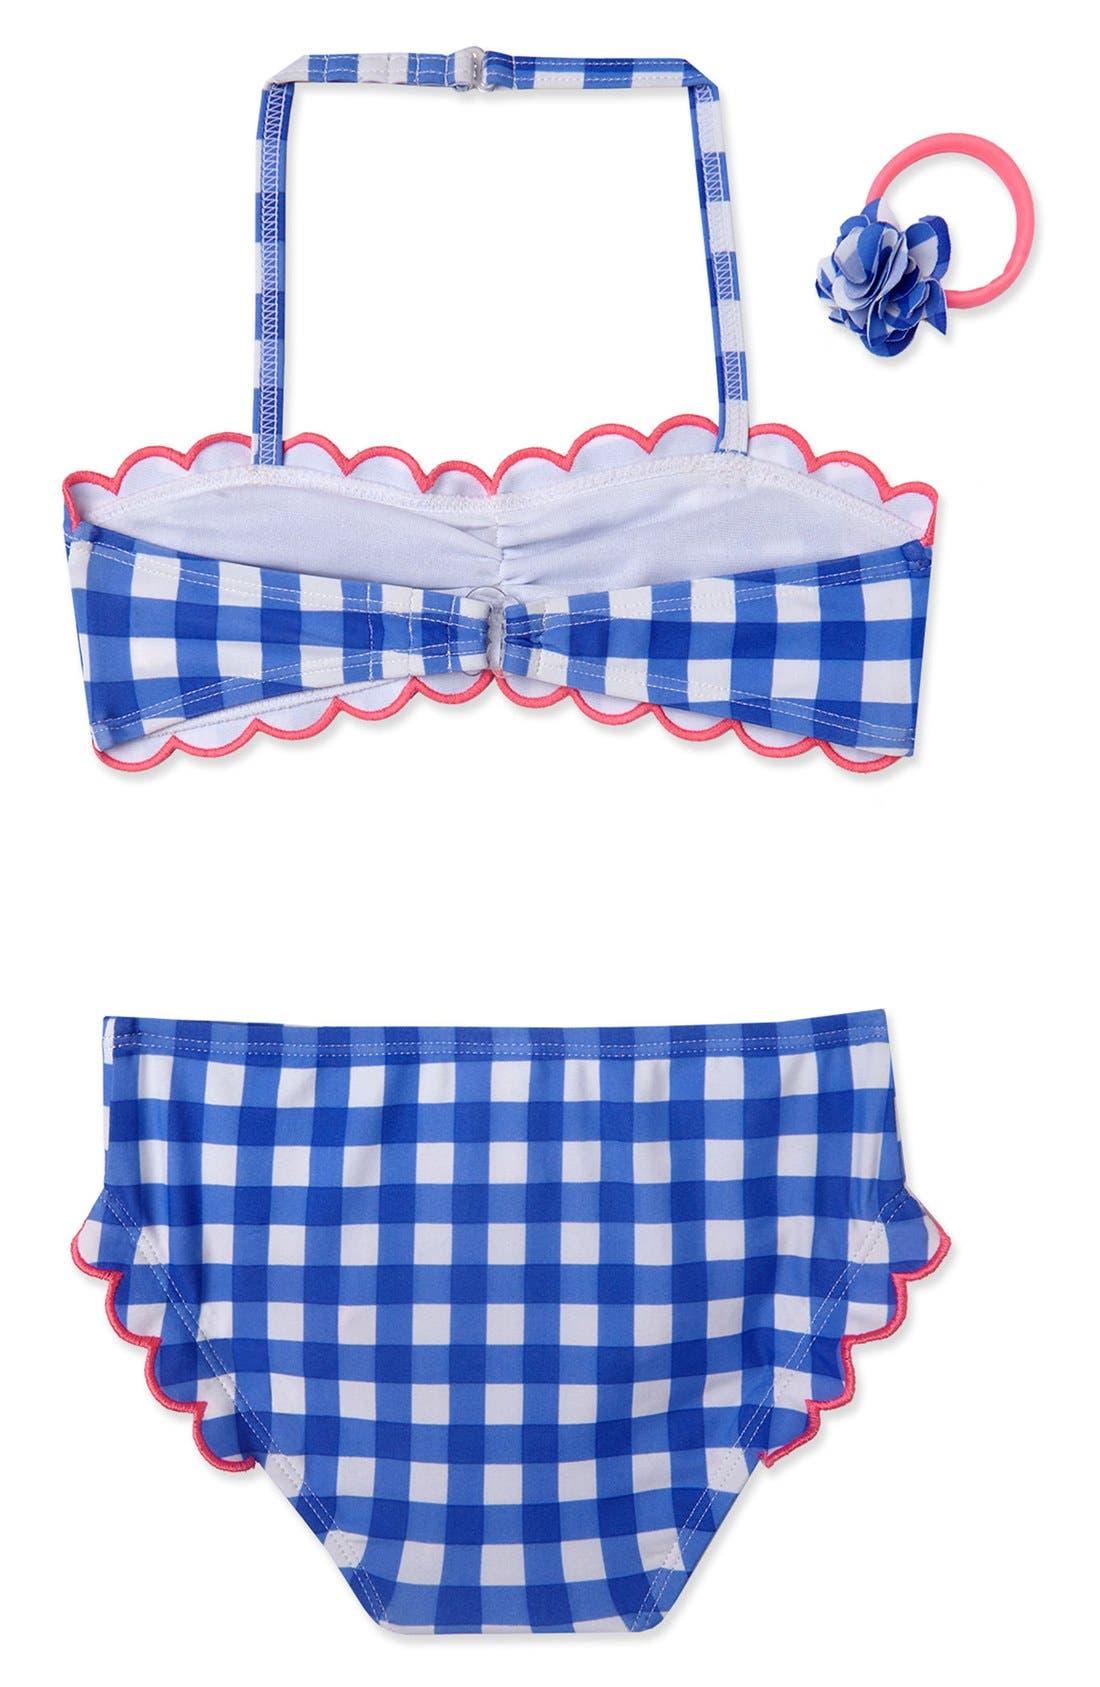 Alternate Image 2  - Hula Star Gingham Two-Piece Swimsuit & Ponytail Holder Set (Toddler Girls & Little Girls)